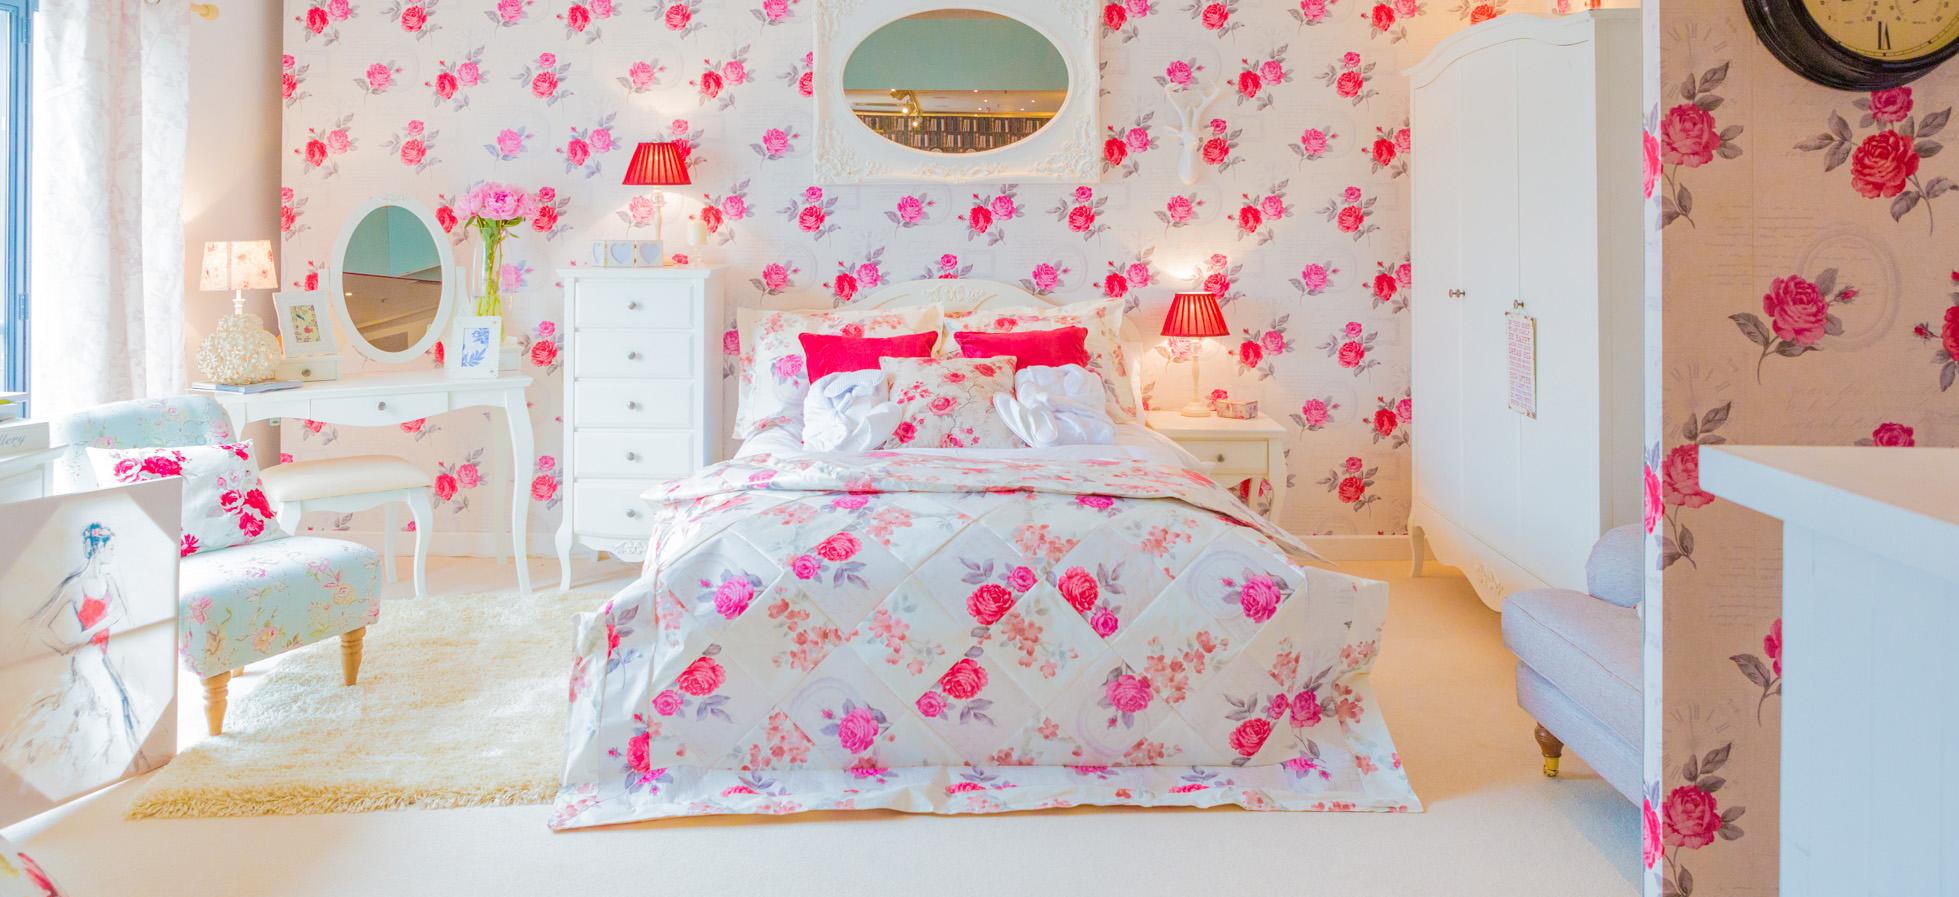 Homebase Bedroom Wallpaper - 8x8 - Download HD Wallpaper